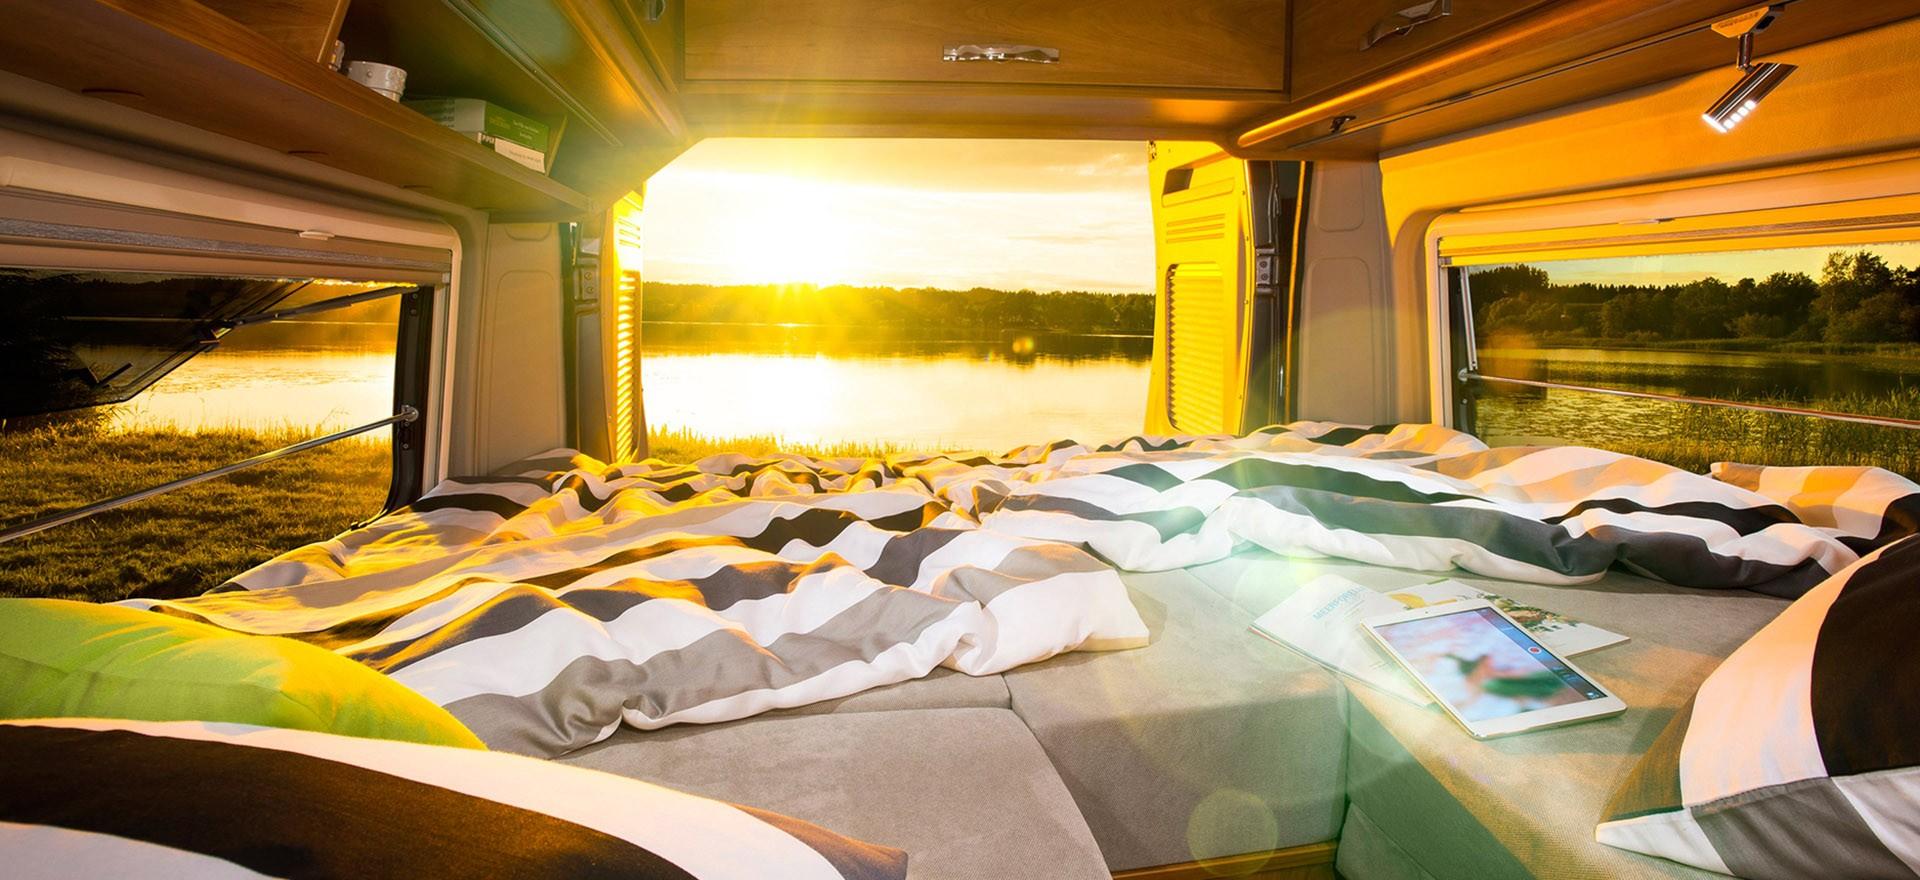 Sonnenaufgang im Wohnmobil